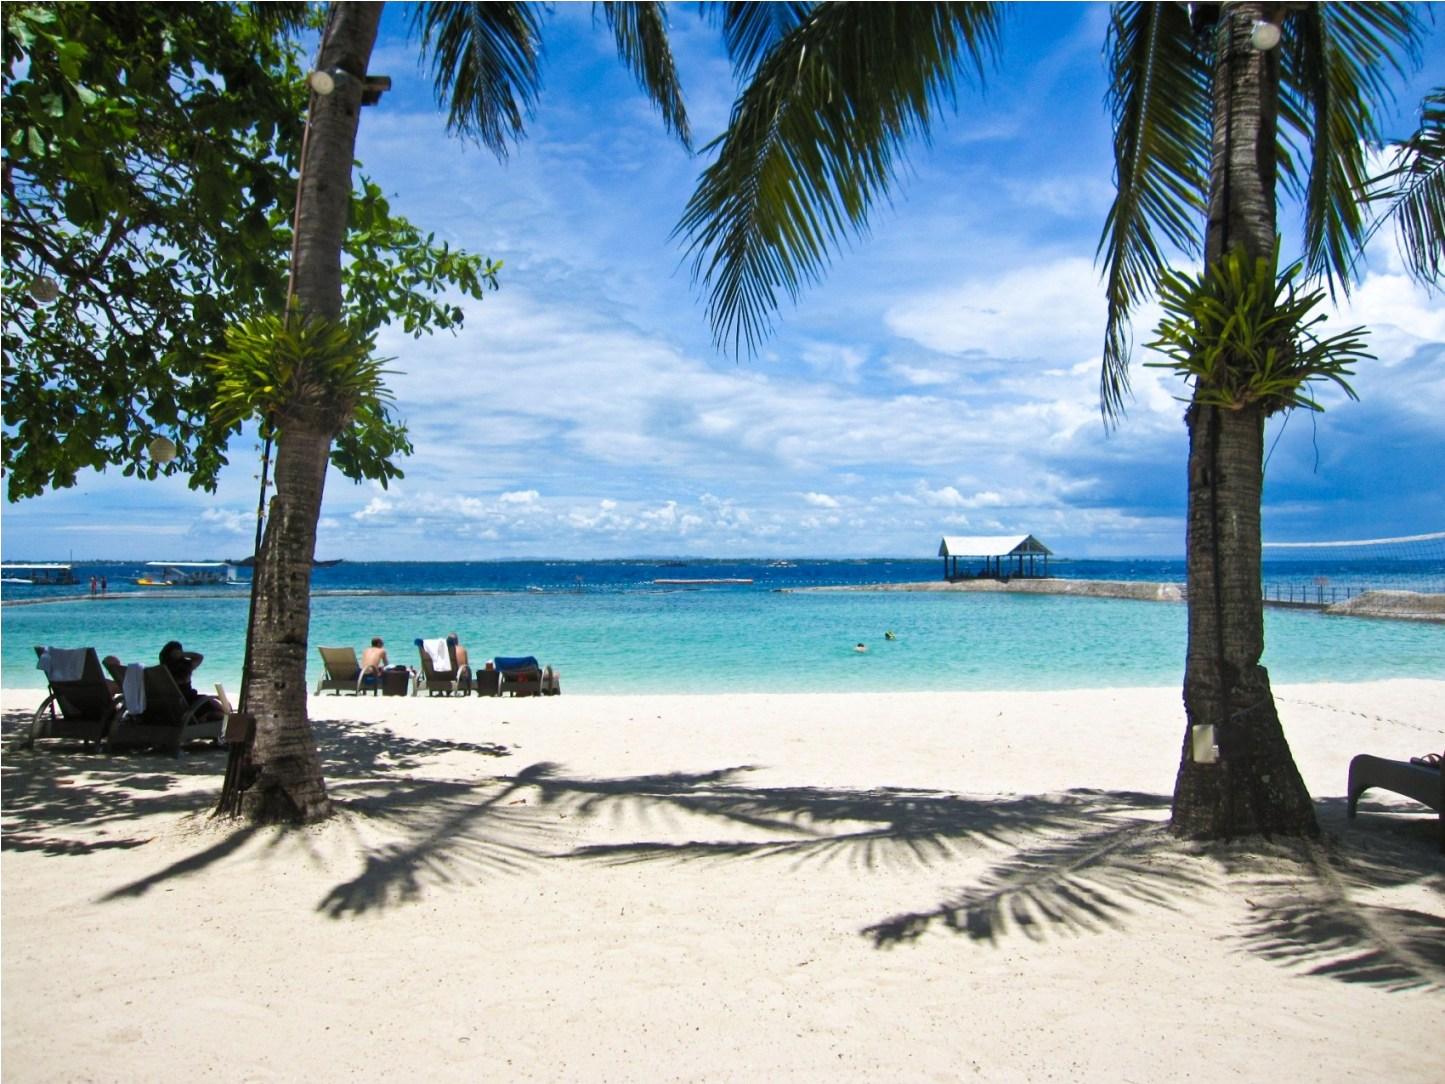 Пляжи на филиппинах фото